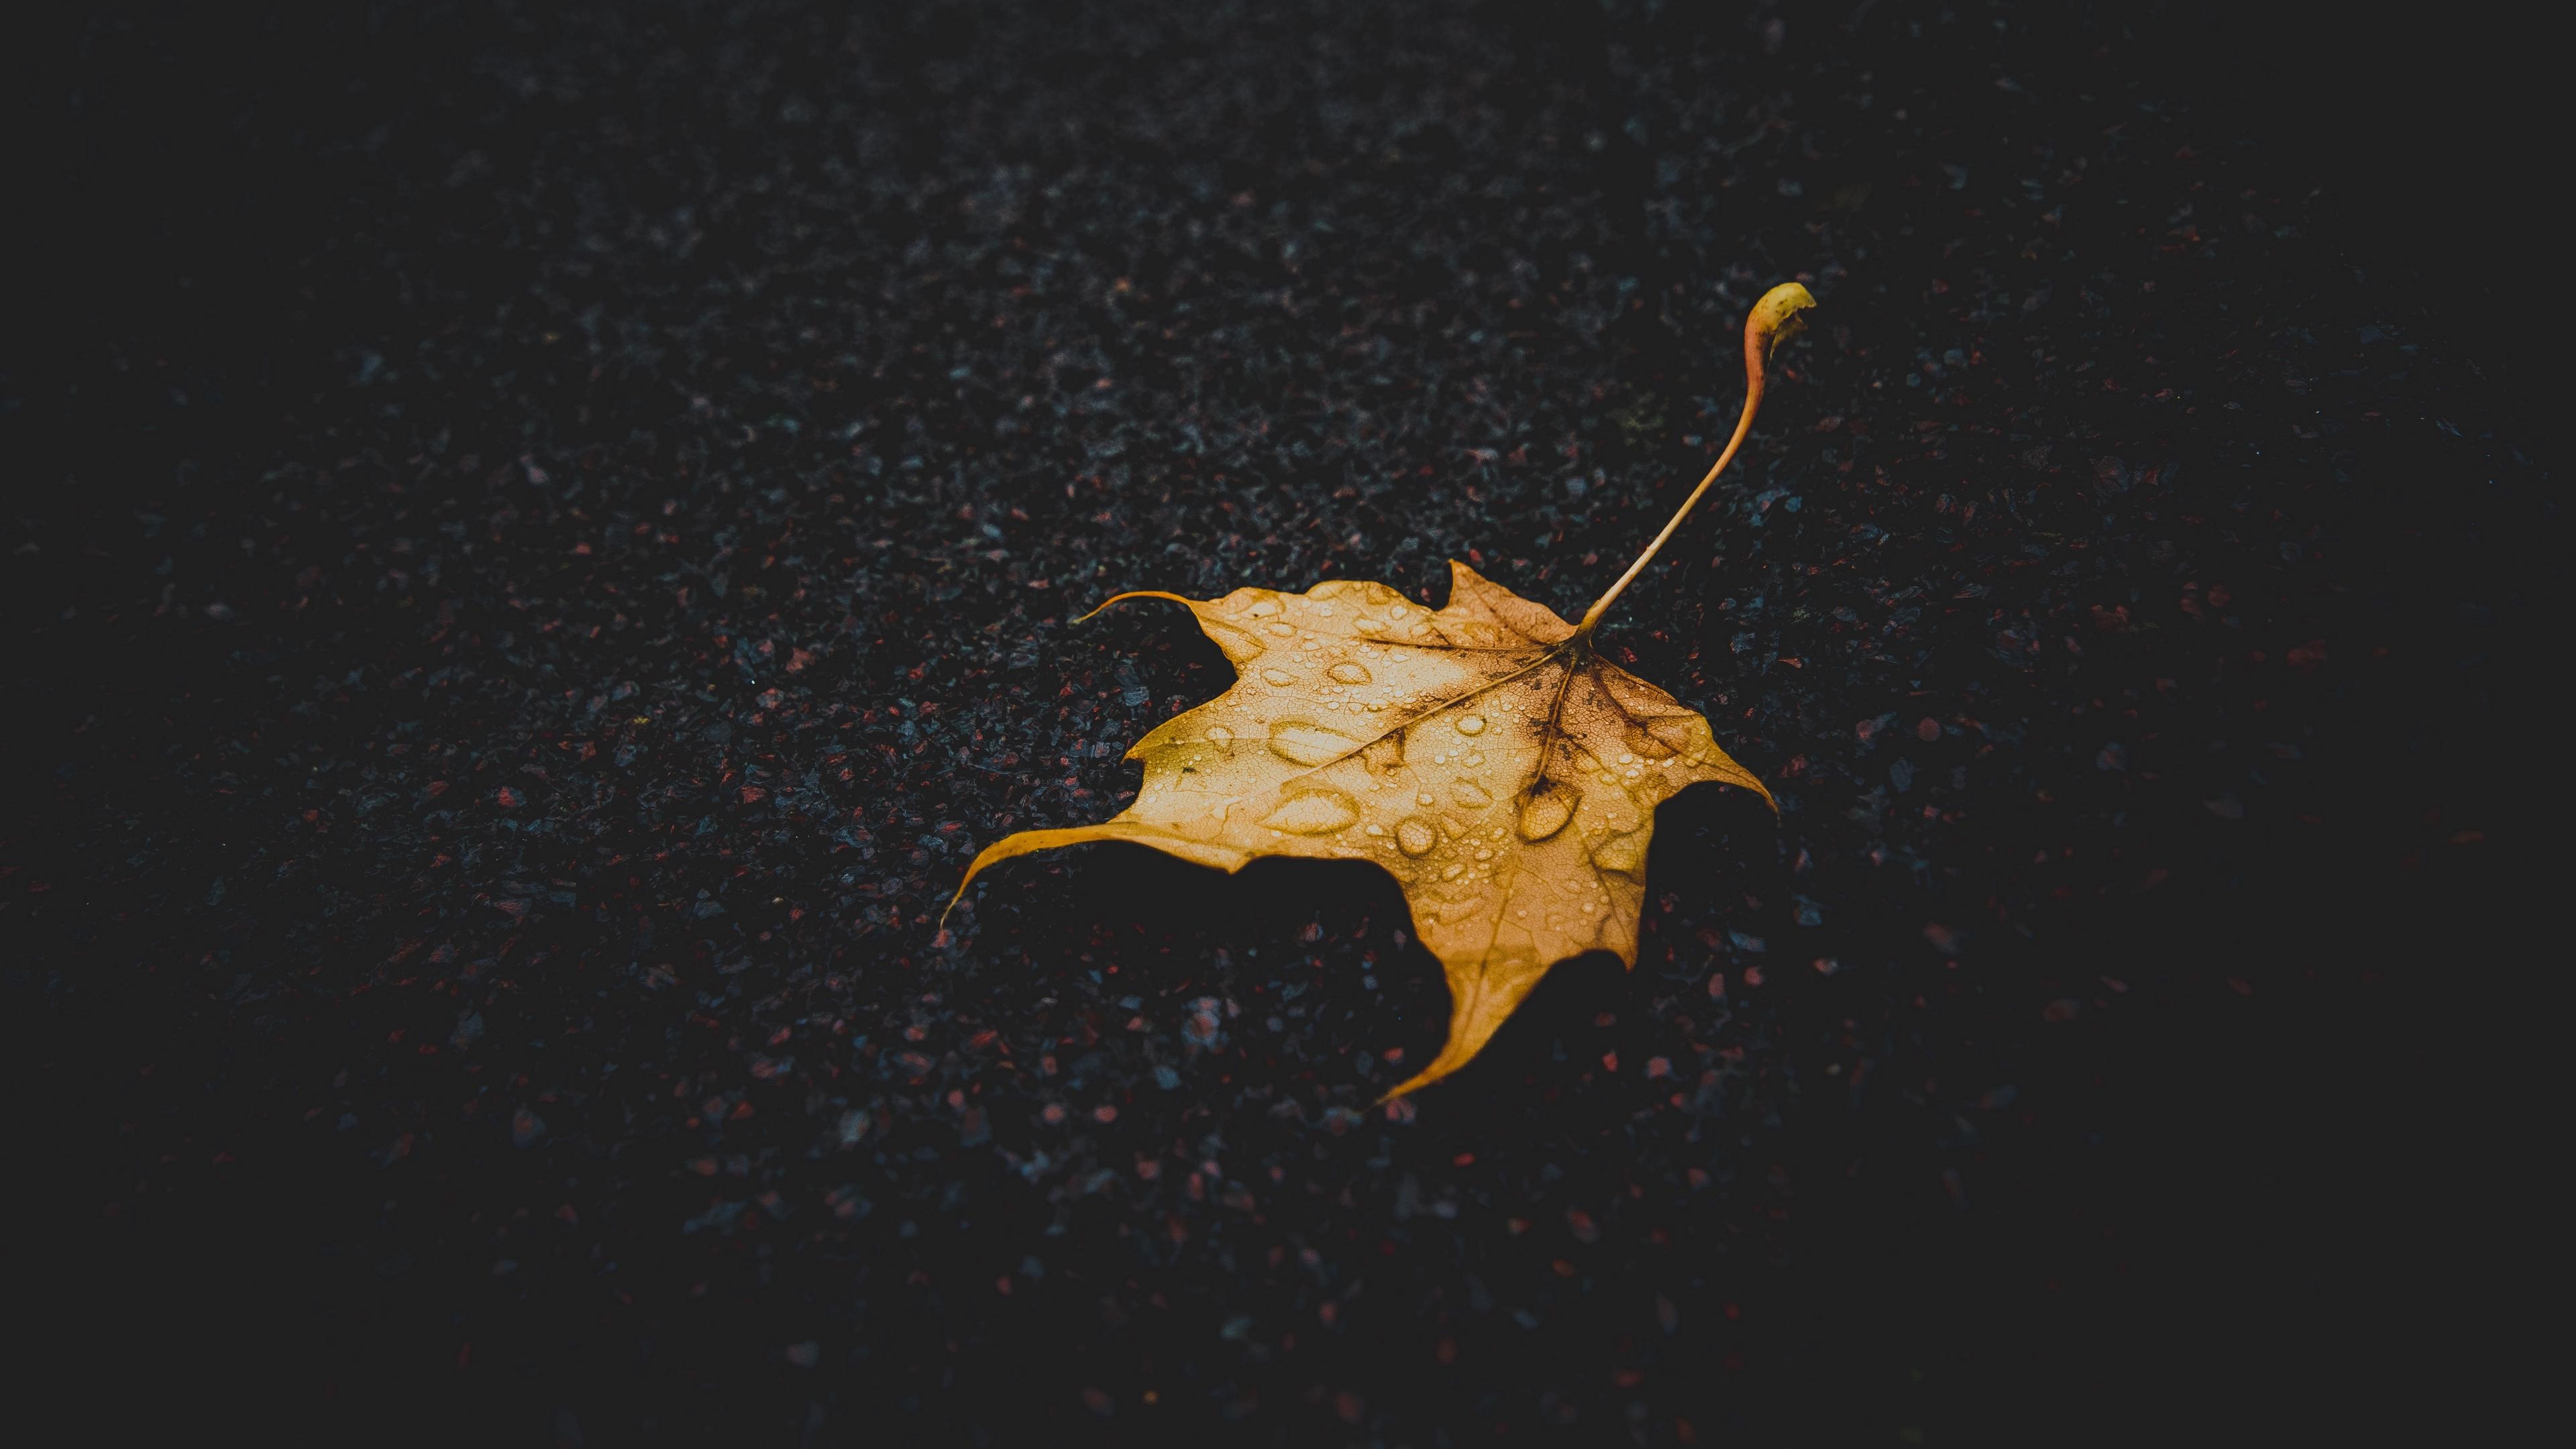 leaf maple dry fallen drops 4k 1540576133 - leaf, maple, dry, fallen, drops 4k - Maple, leaf, dry